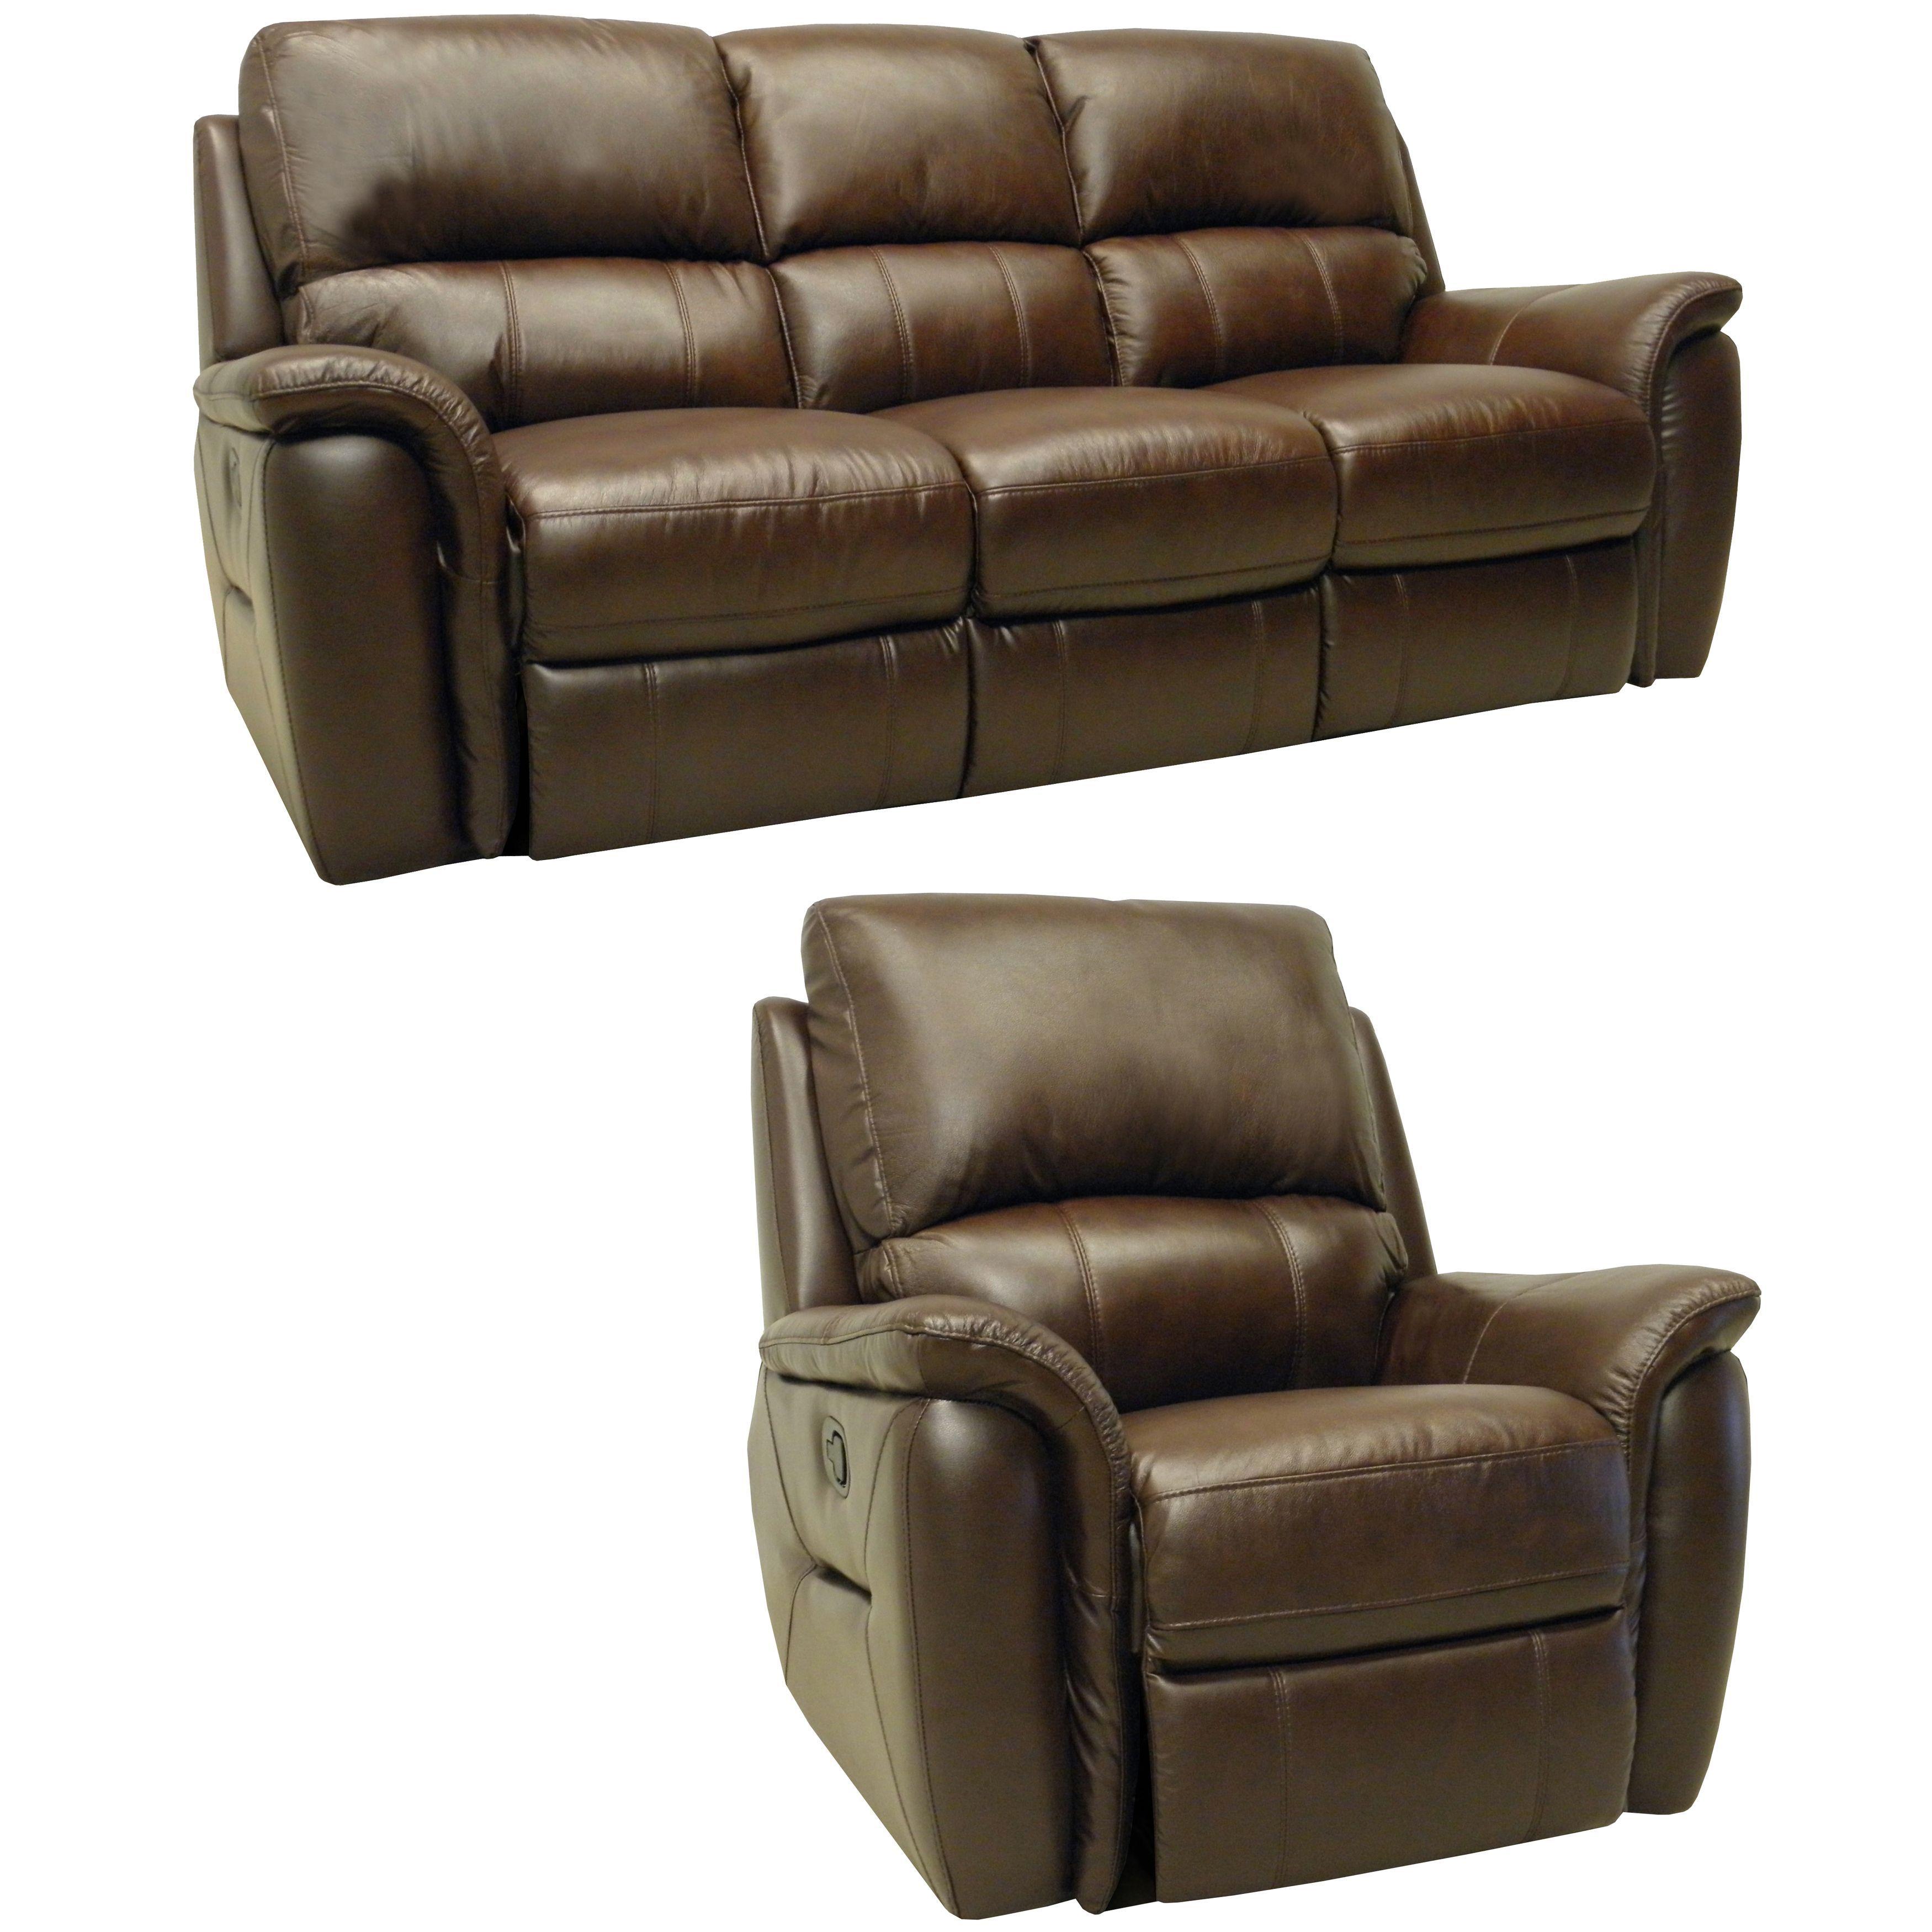 companies wellington leather furniture promote american. Porter Brown Italian Leather Reclining Sofa And Glider/Recliner Chair Companies Wellington Furniture Promote American